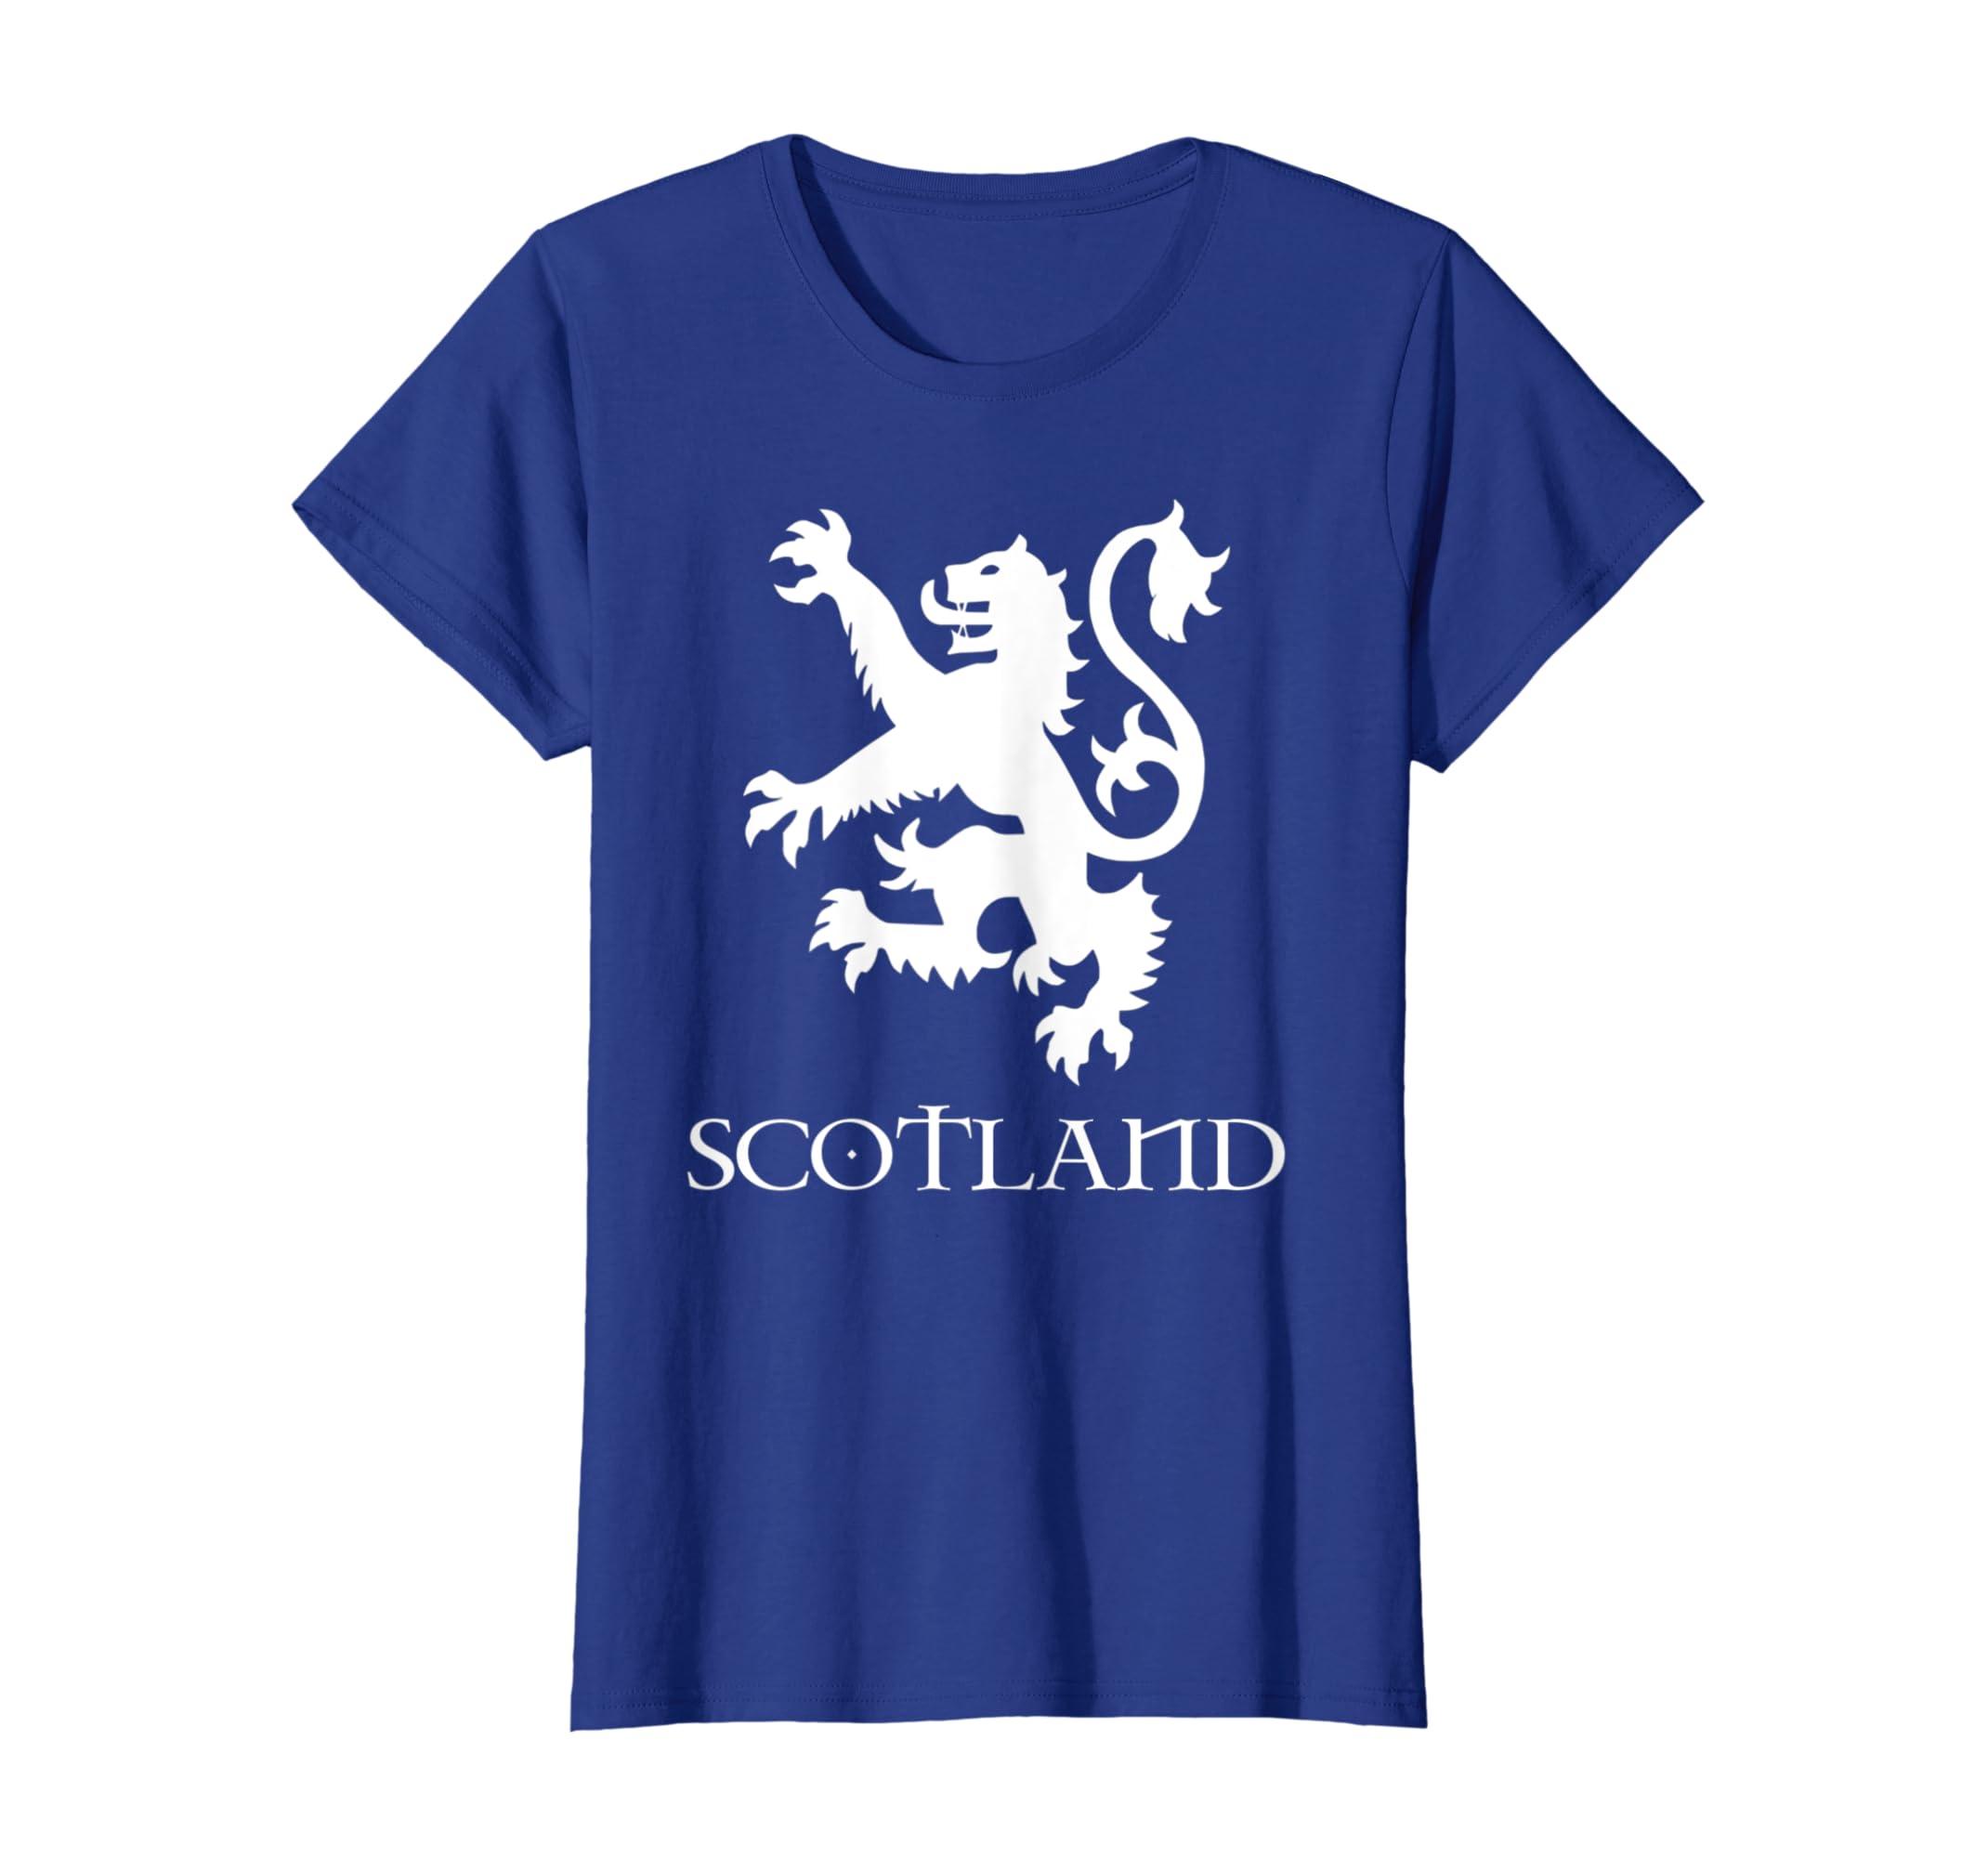 bbb9f3d56 Amazon.com: Lion Rampant Scotland Scottish T shirt Mens Womens: Clothing